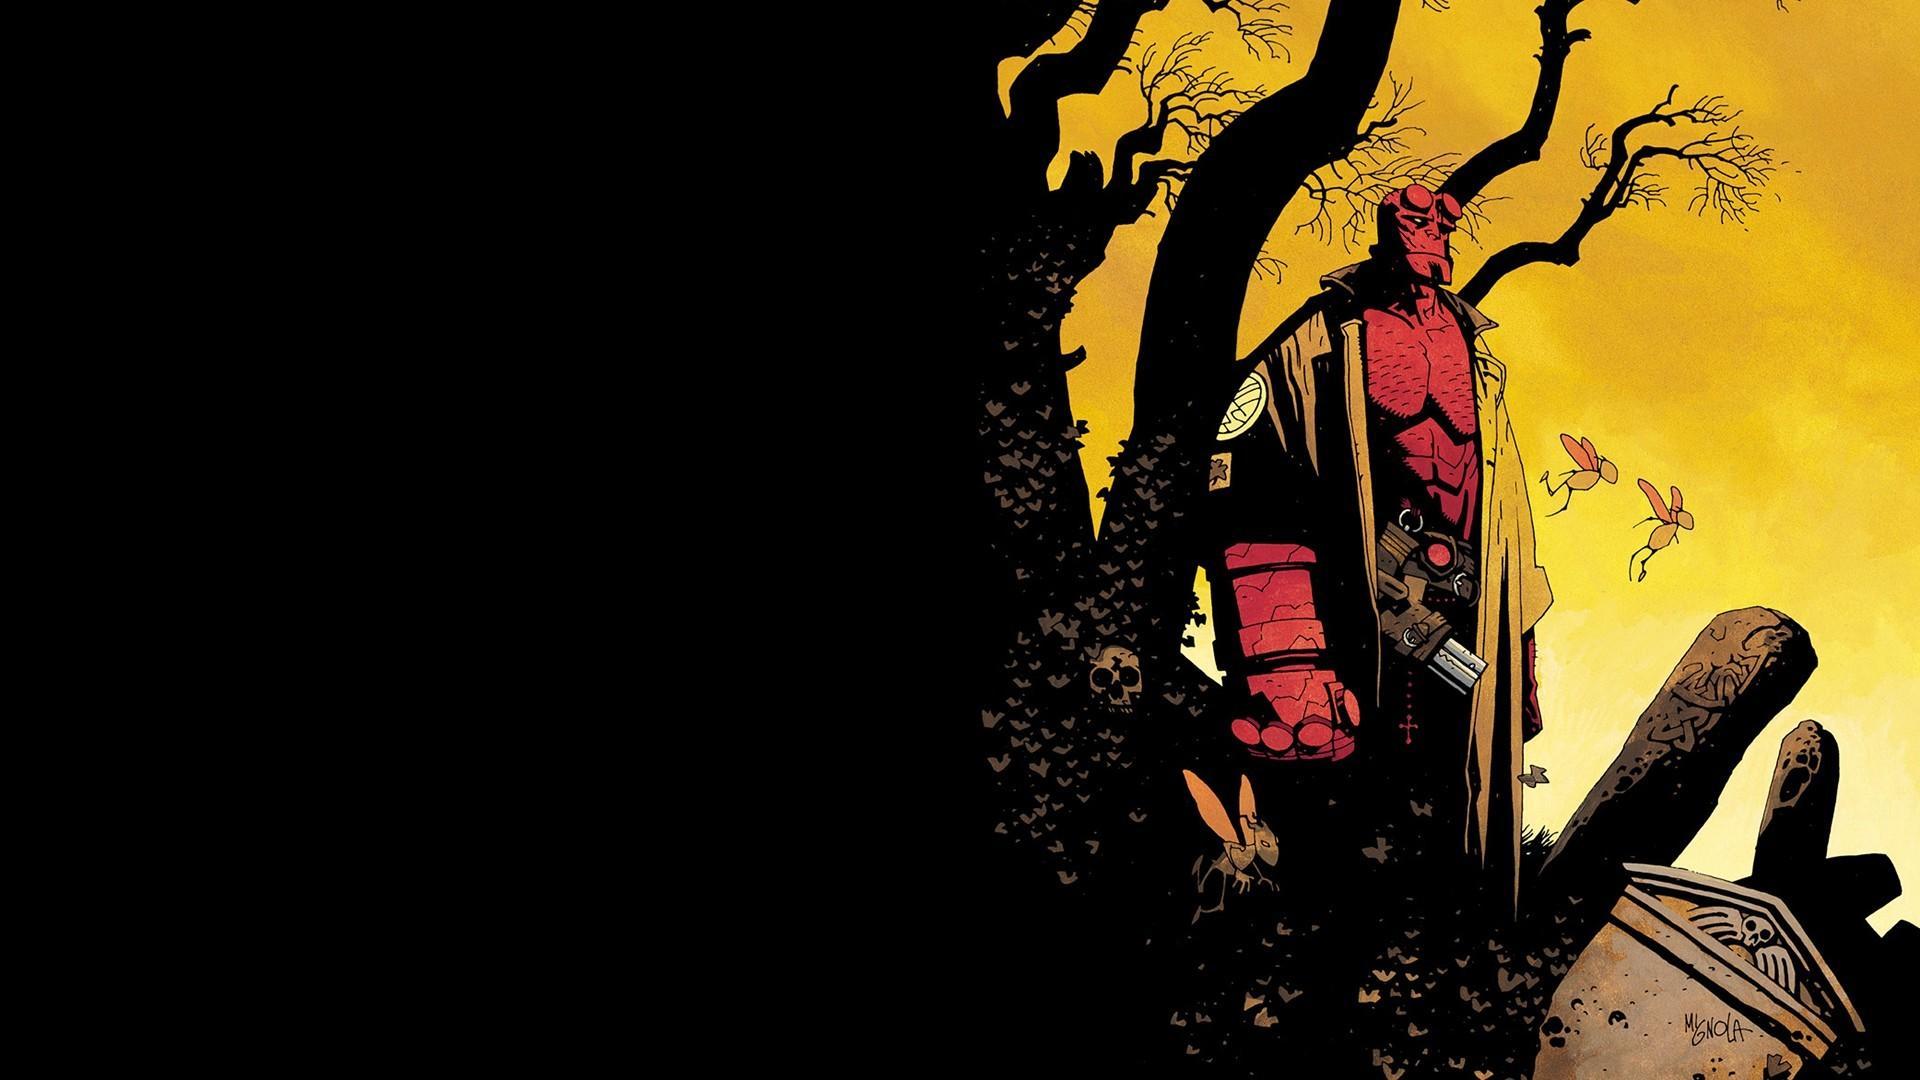 Hellboy Wallpapers For Phones Wallpapersafari